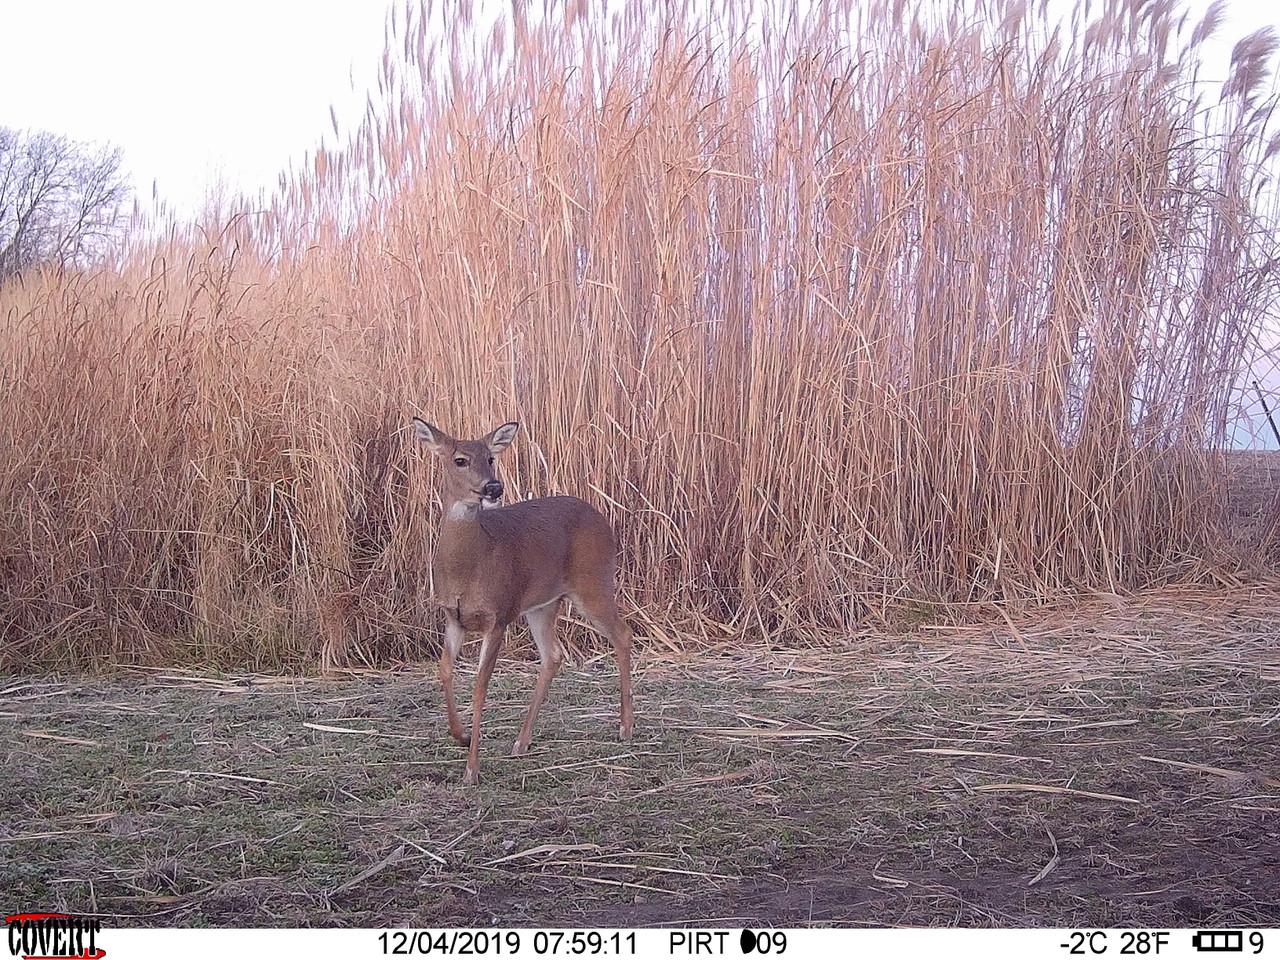 Real World Giant Miscanthus Grass For Plot Screen For Whitetail Deer